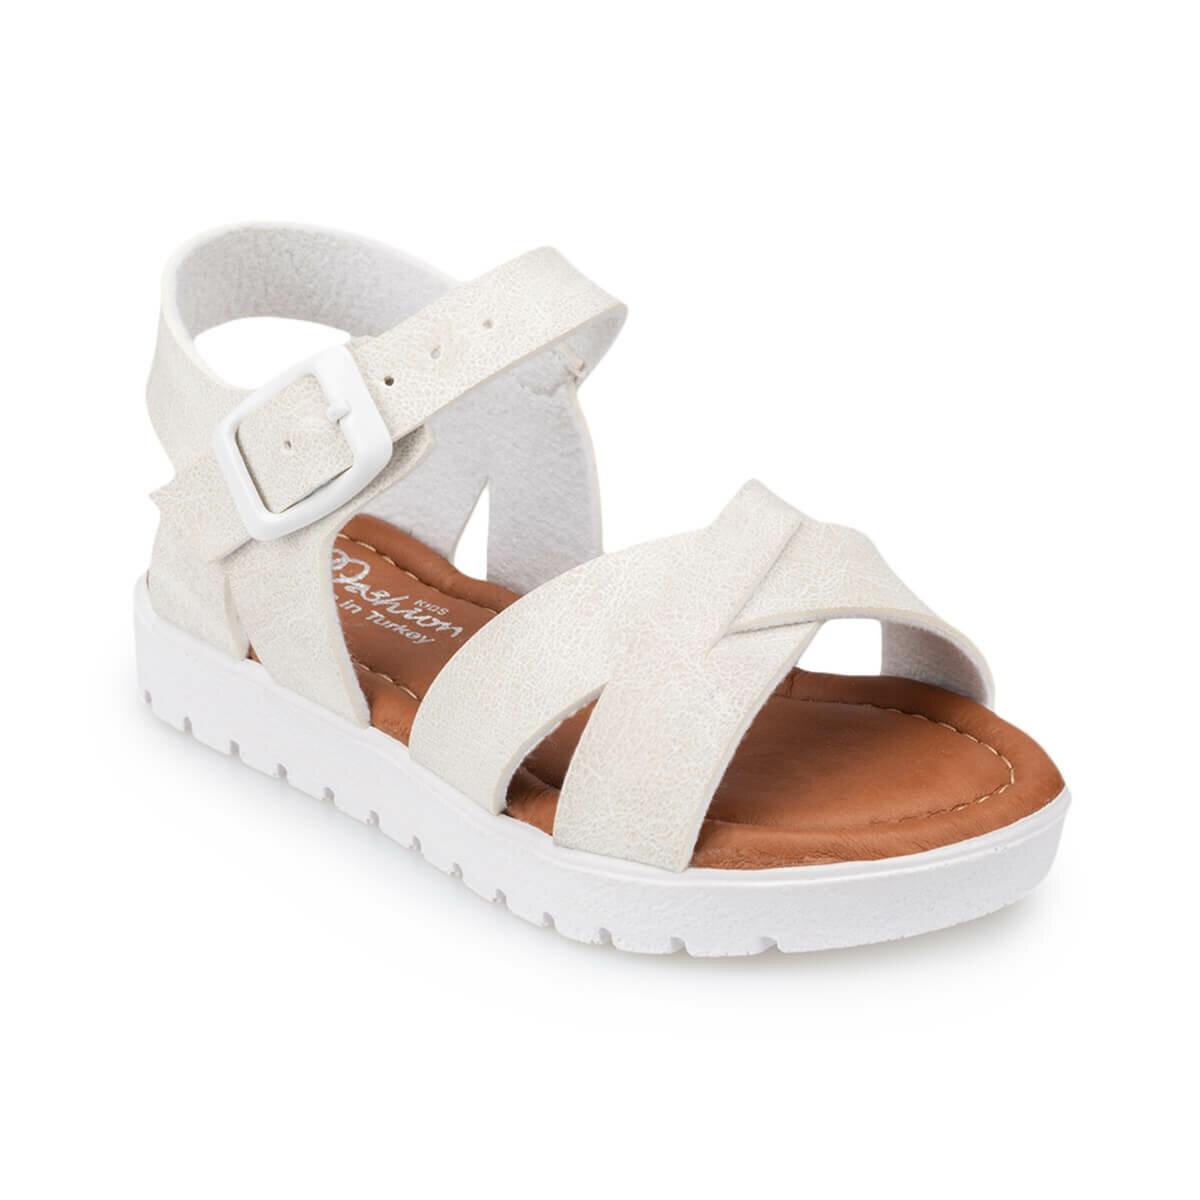 FLO Girls Sandals Gladiator Sweet Soft Children's Beach Shoes Kids Summer Floral Sandals Princess Fashion Cute High Quality Polaris 91. 508159.F